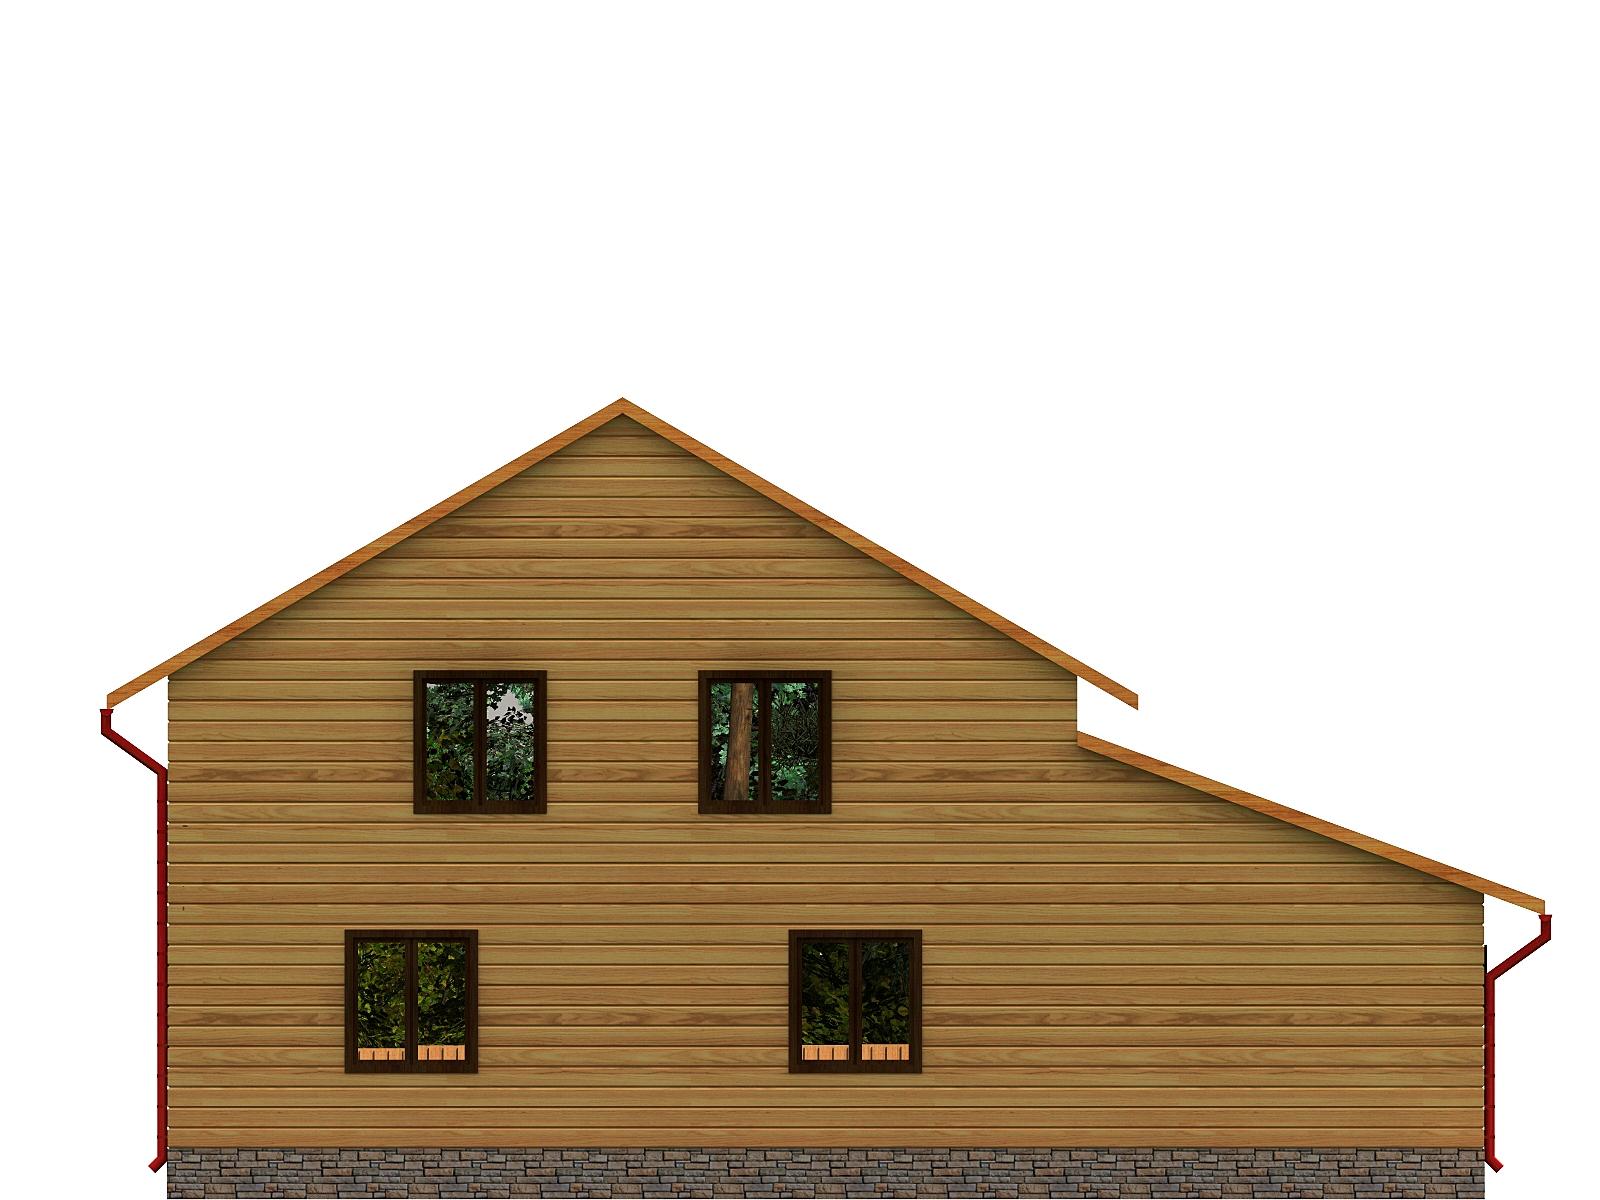 Проект дома из бруса 9,3х12,8 1,5 этажа с гаражом. Разрез 2.